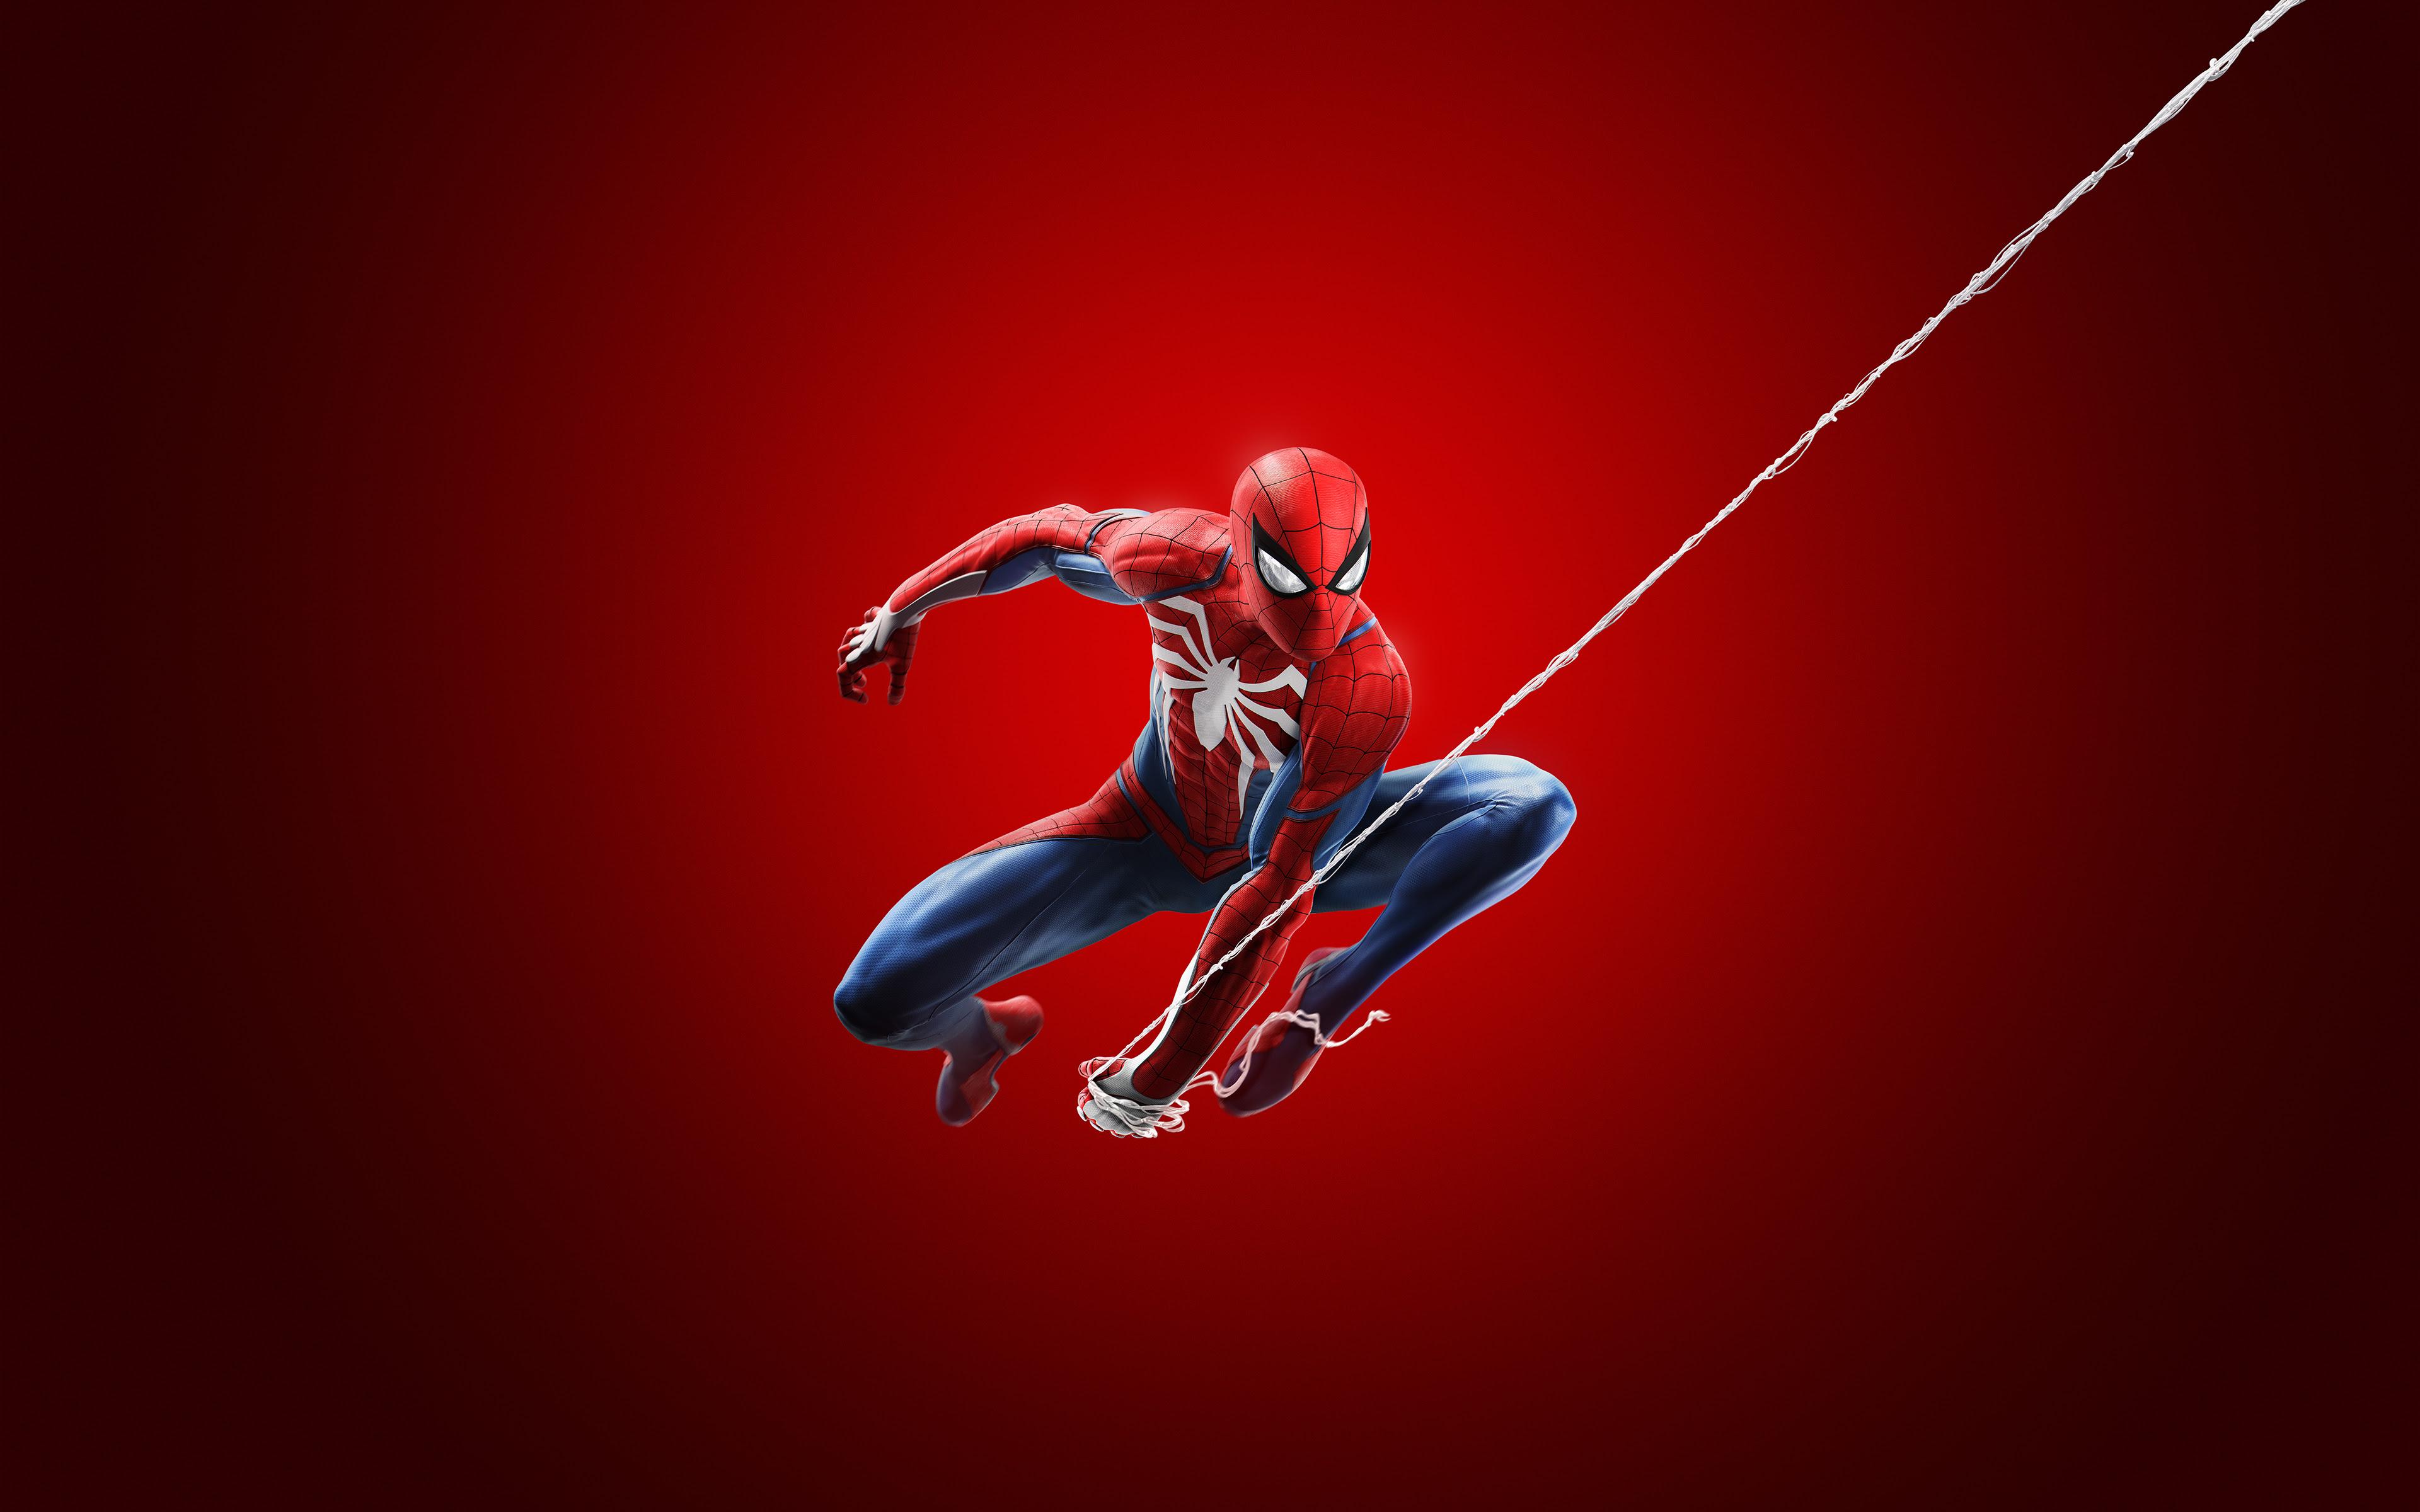 Marvel's Spider-Man 4K 8K Wallpapers | HD Wallpapers